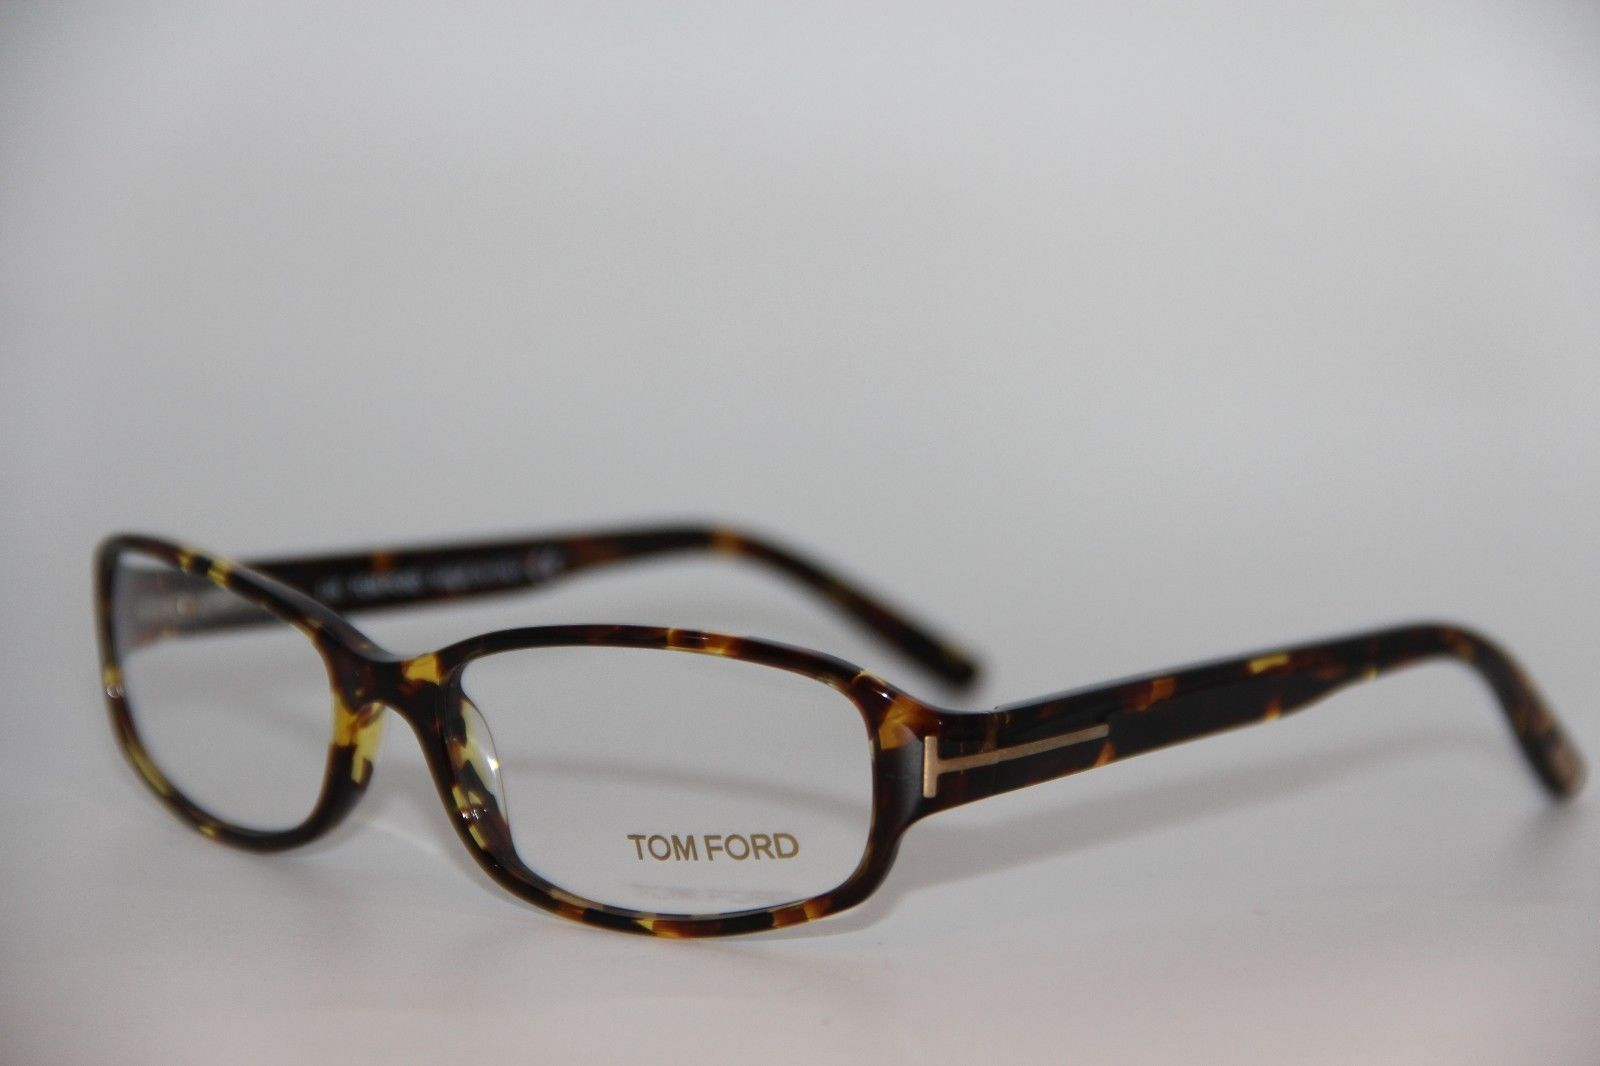 05b55e277cd New Tom Ford Tf 5087 015 Havana Eyeglasses and 14 similar items. 57